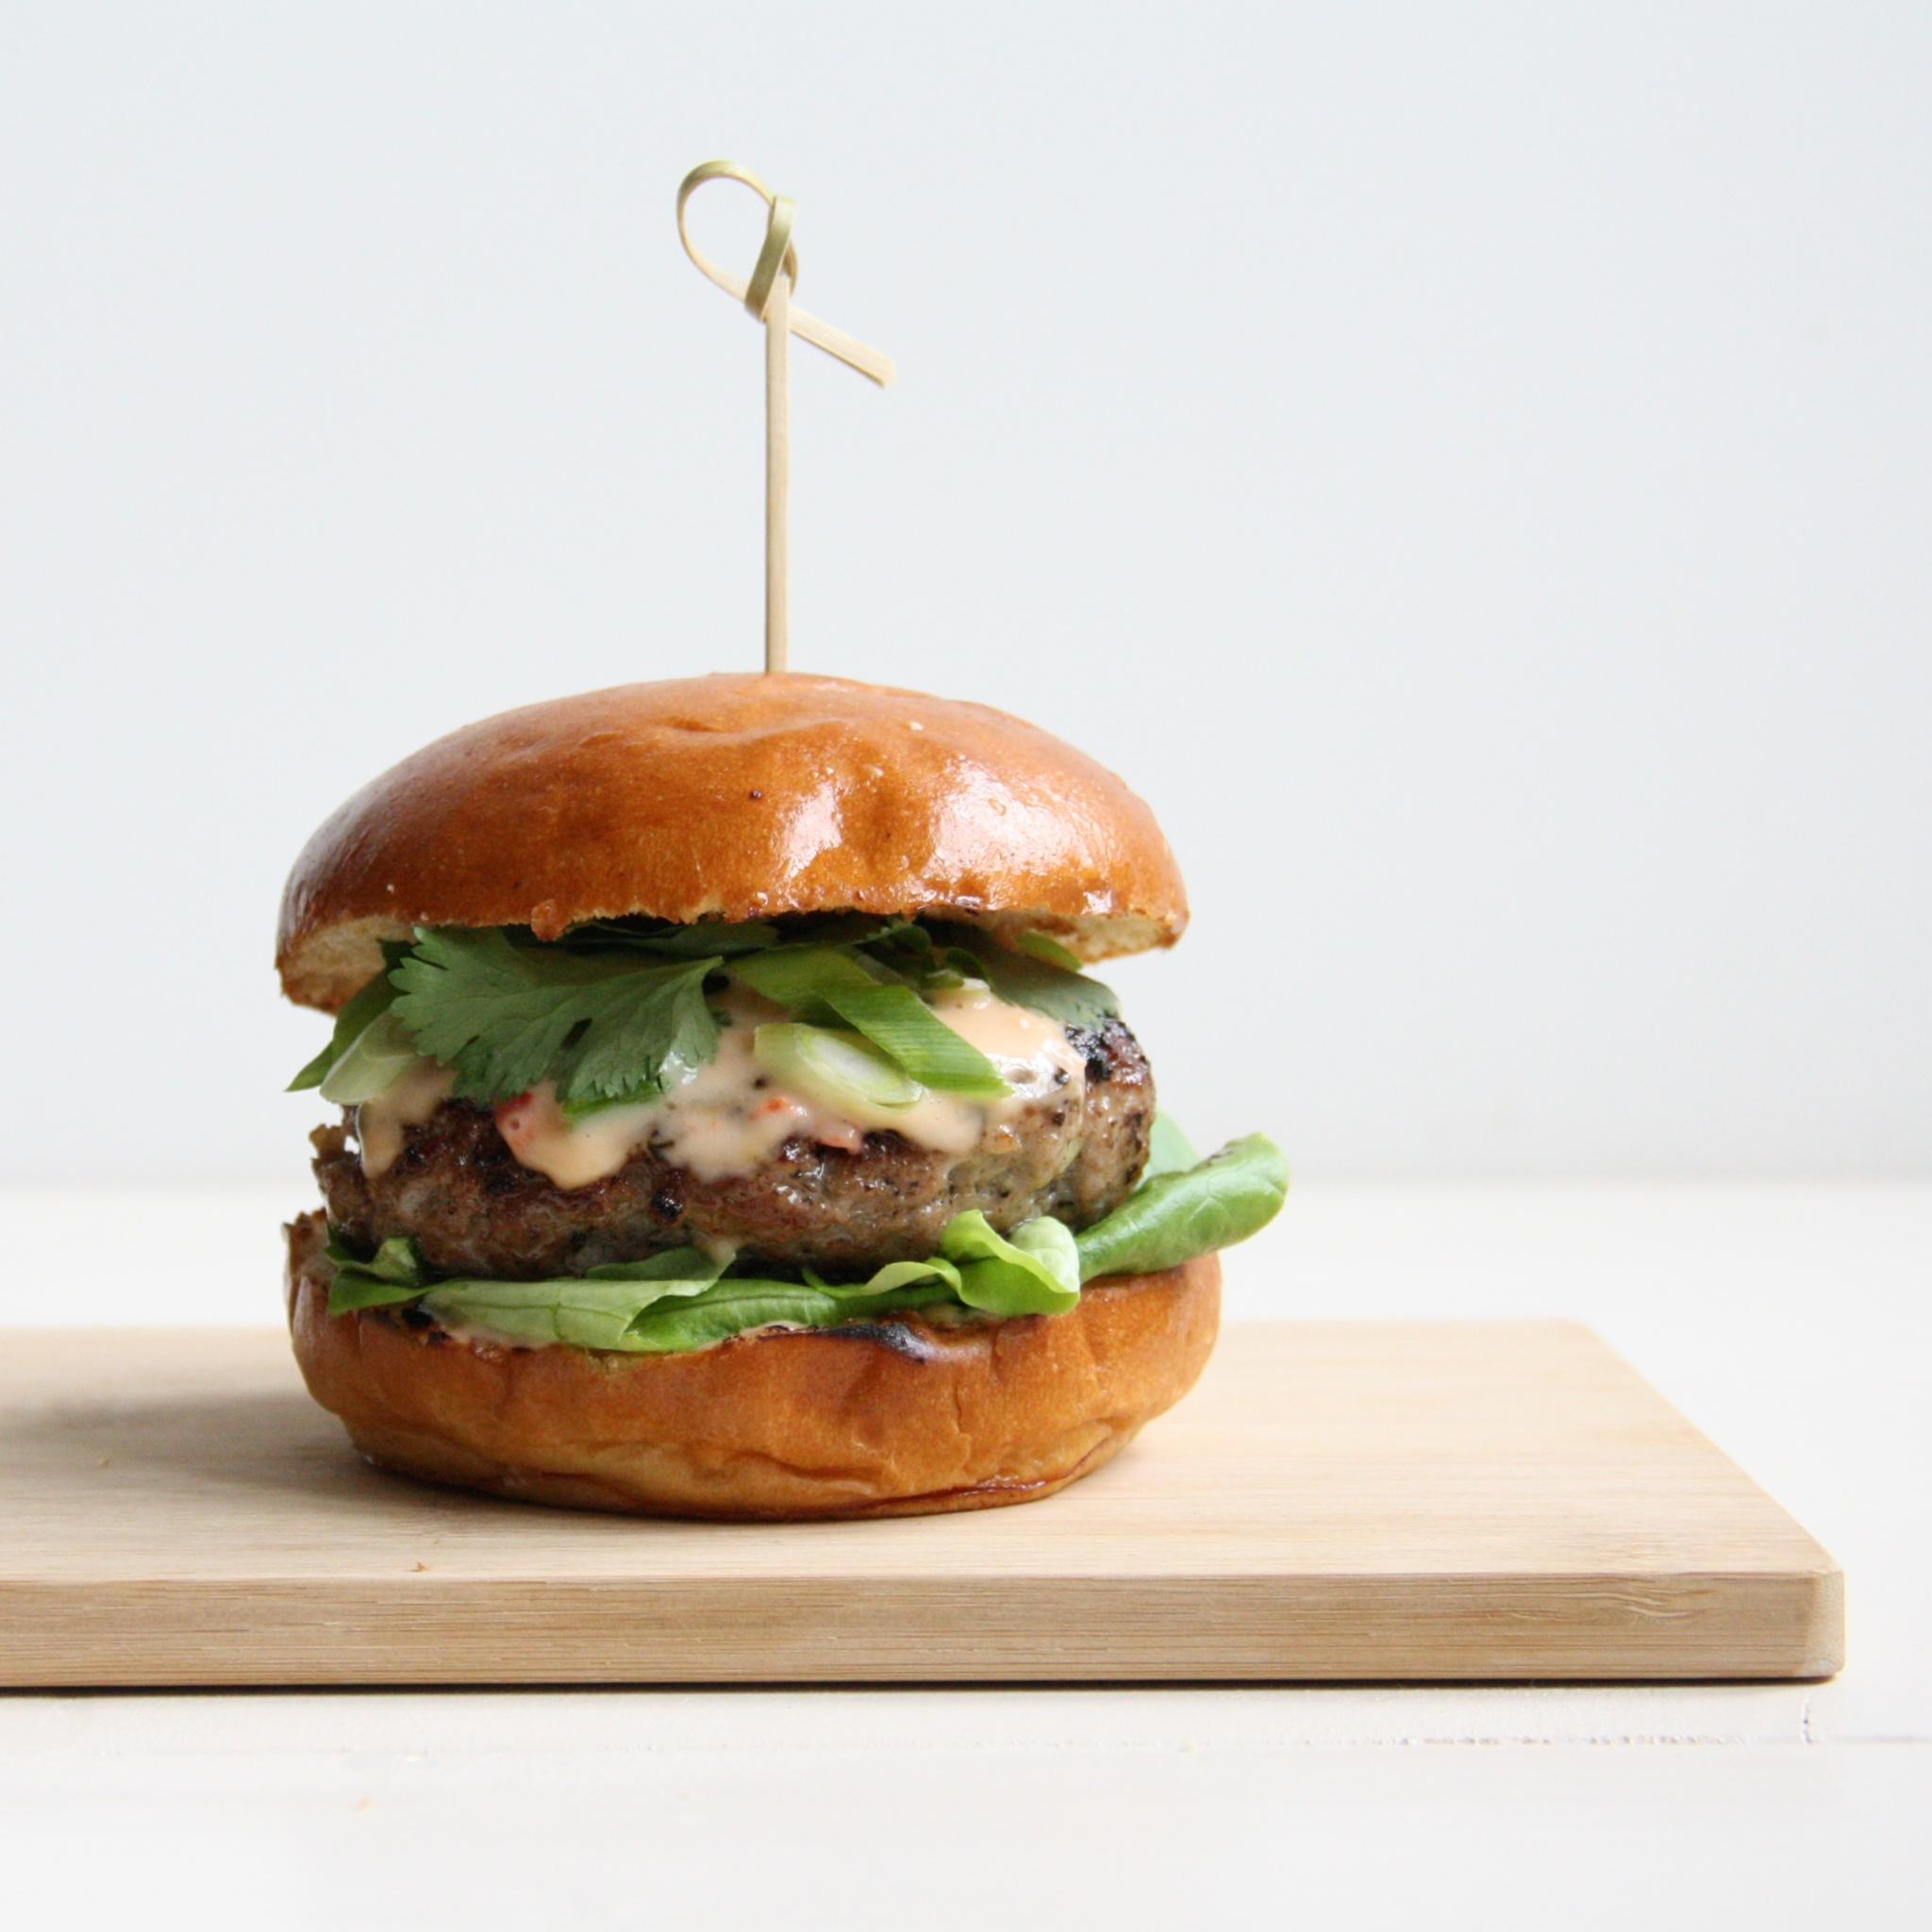 IMG 9014 - Vietnamese Burger Culinessa style